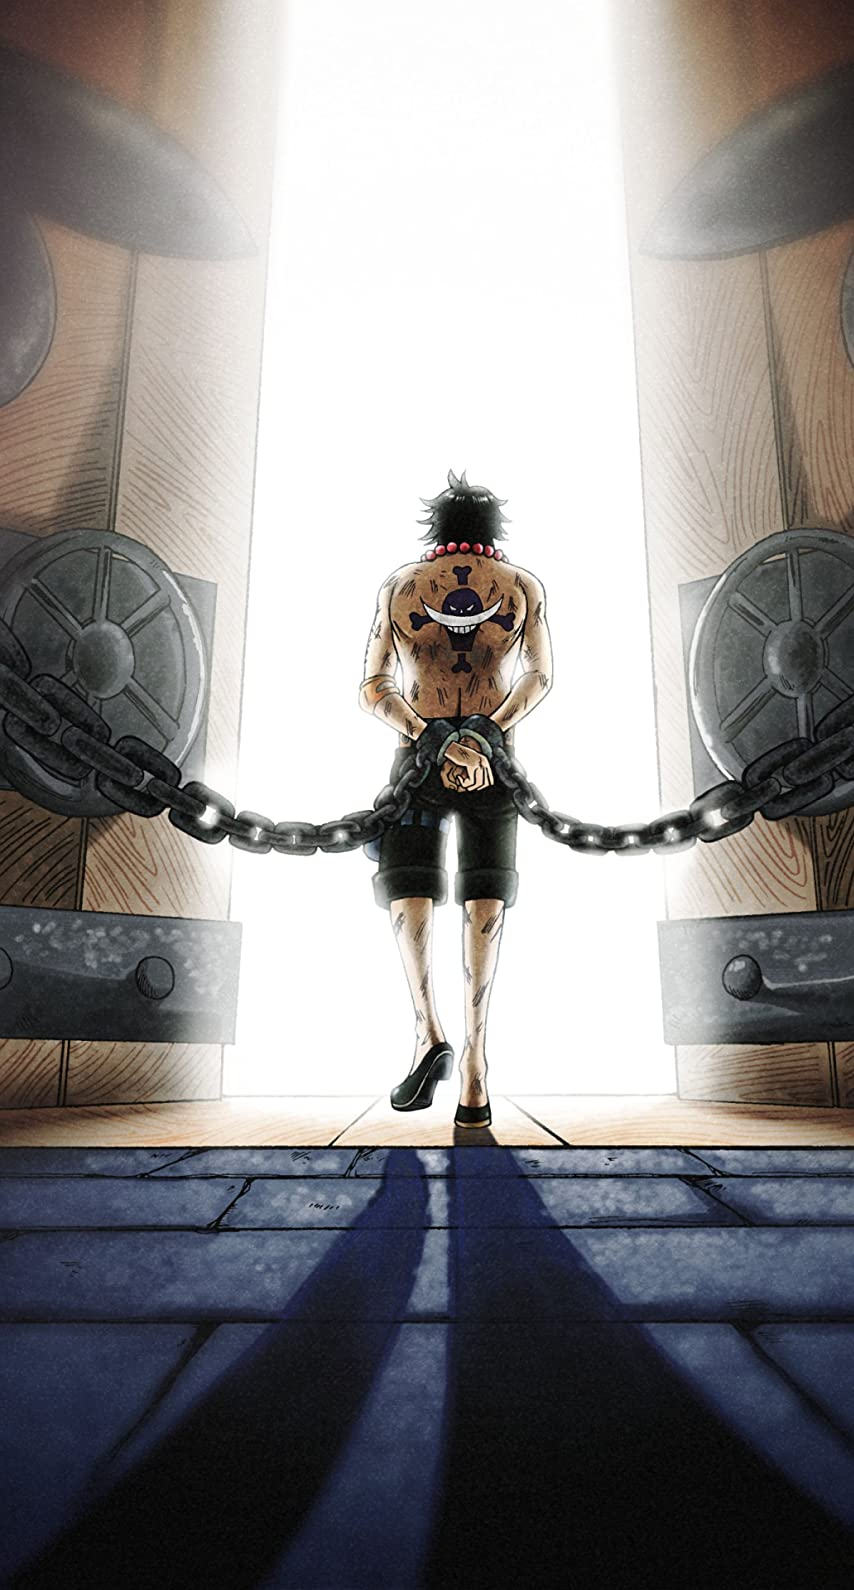 One Piece Iphone8 7 6s 6 壁紙 視差効果アニメ画像27179 スマポ